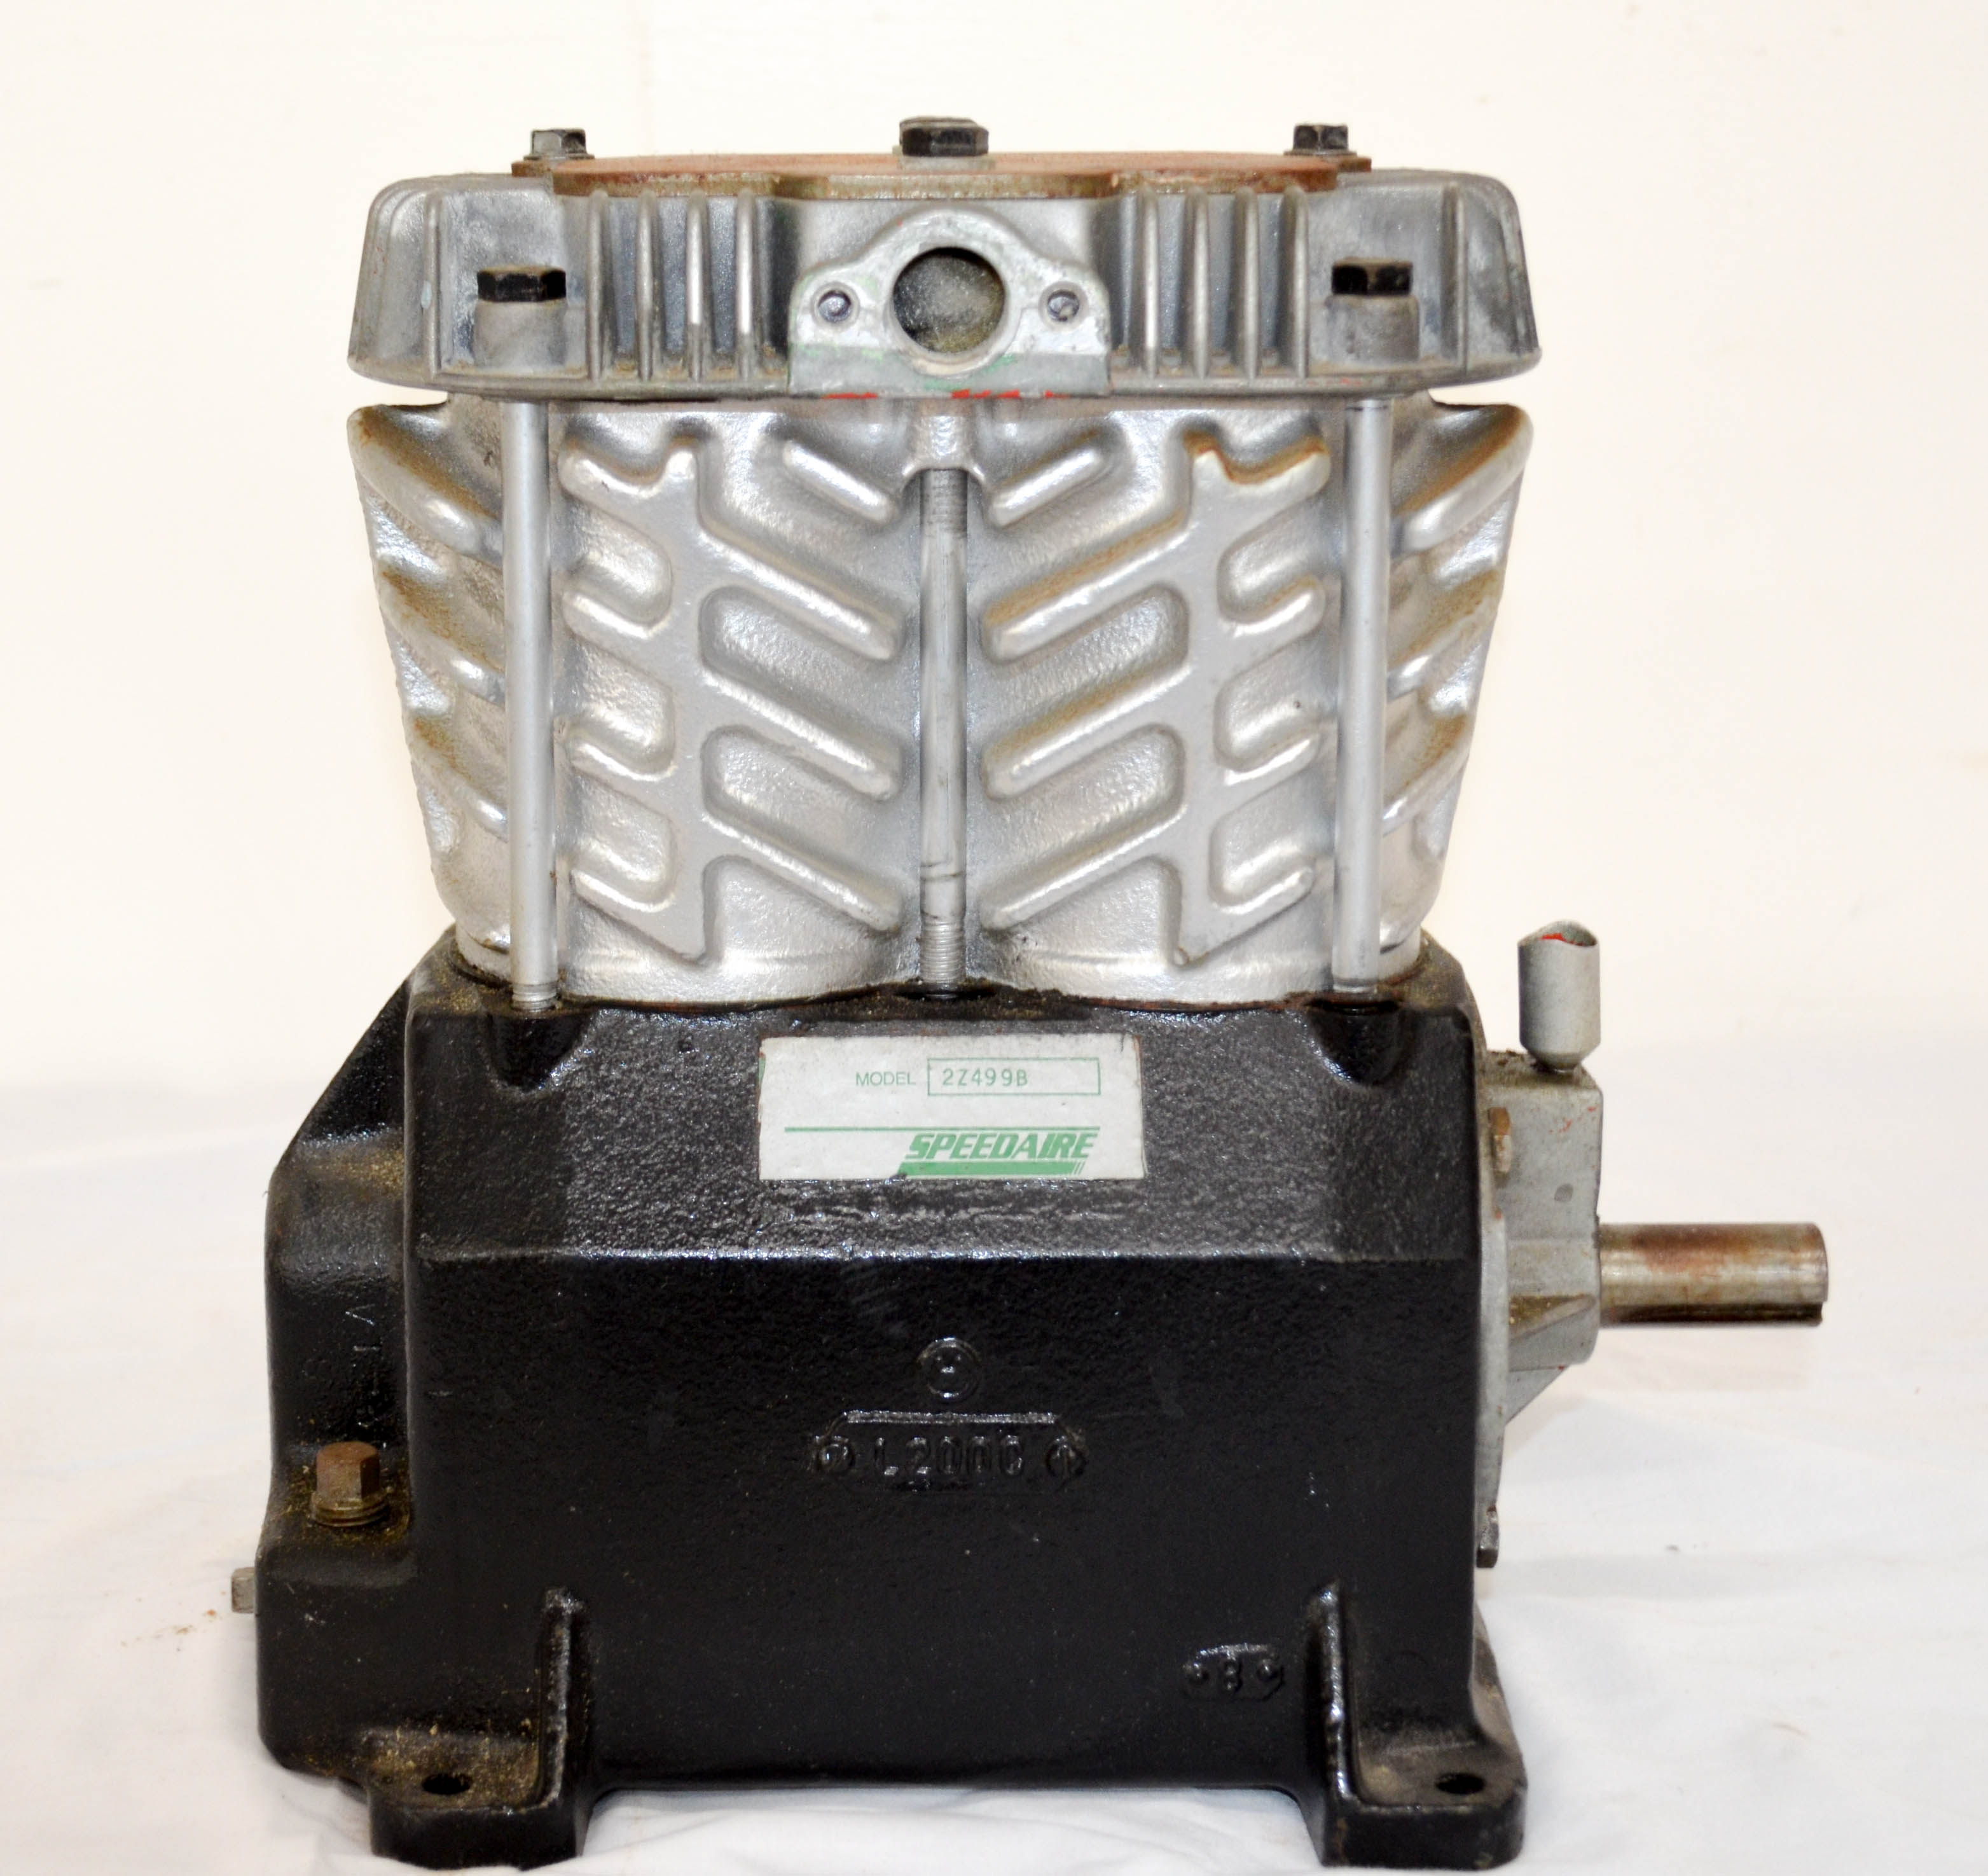 68 Speedaire Model 2z499b